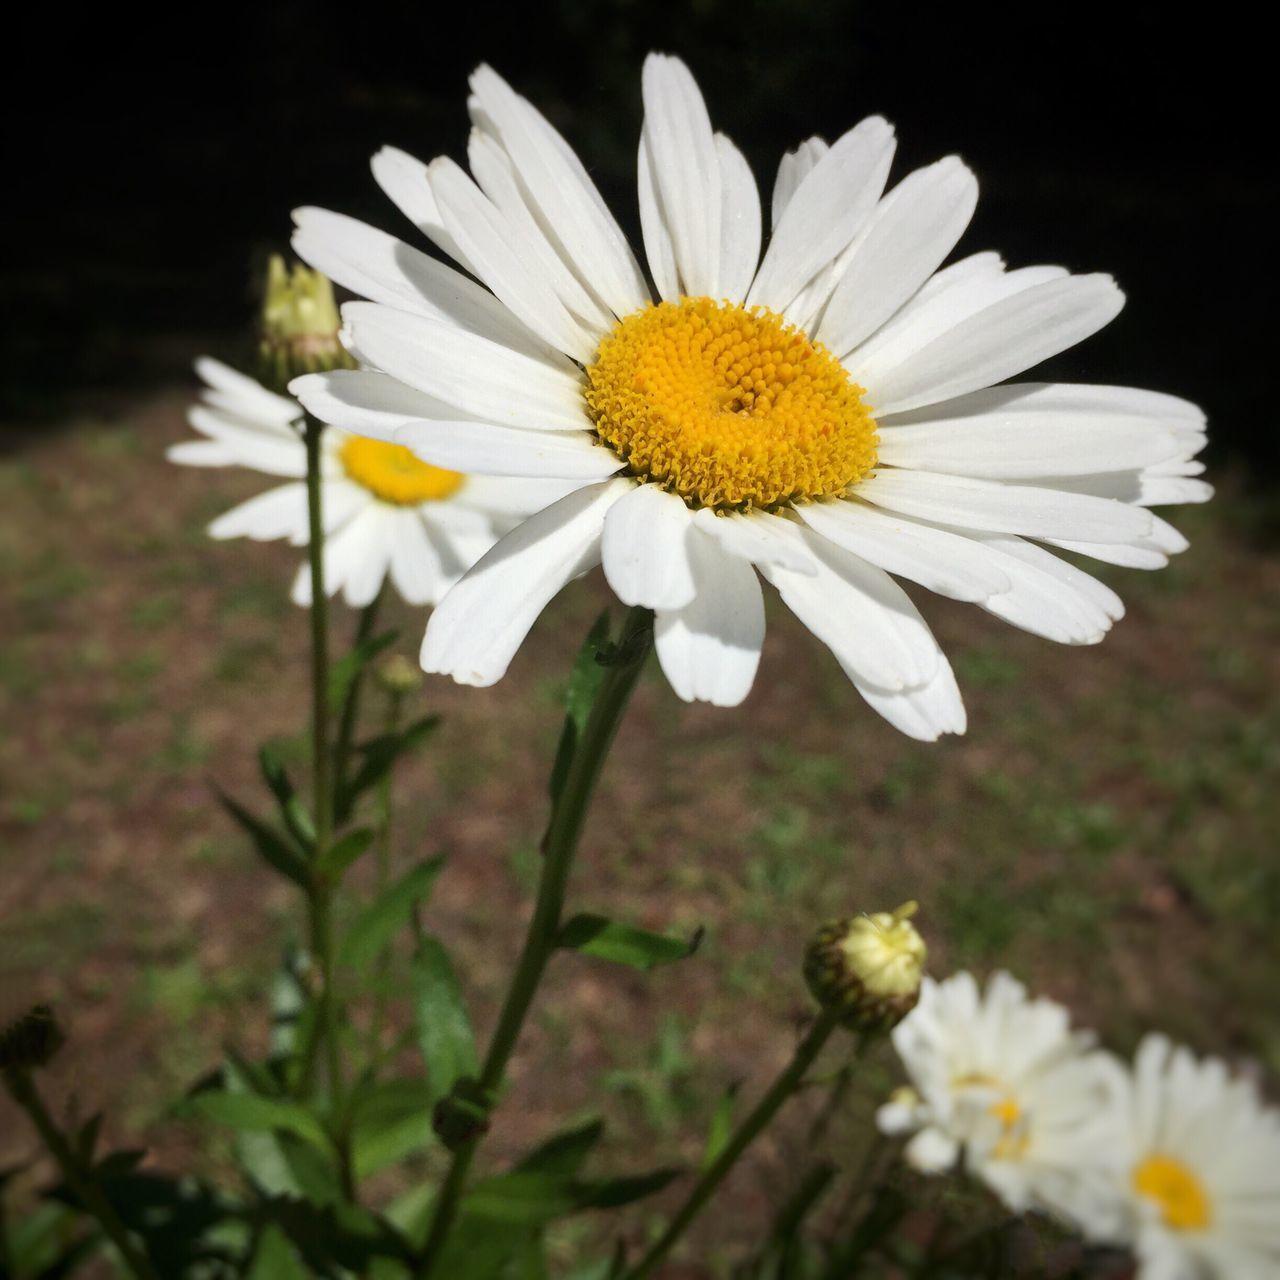 Daisy Enjoying Life Flowers, Nature And Beauty Flowers,Plants & Garden Nature's Best Beautifulflowerseveryday Beauty In Nature Garden Photography Iphonephotography Flowers Eye4photography  Daisy